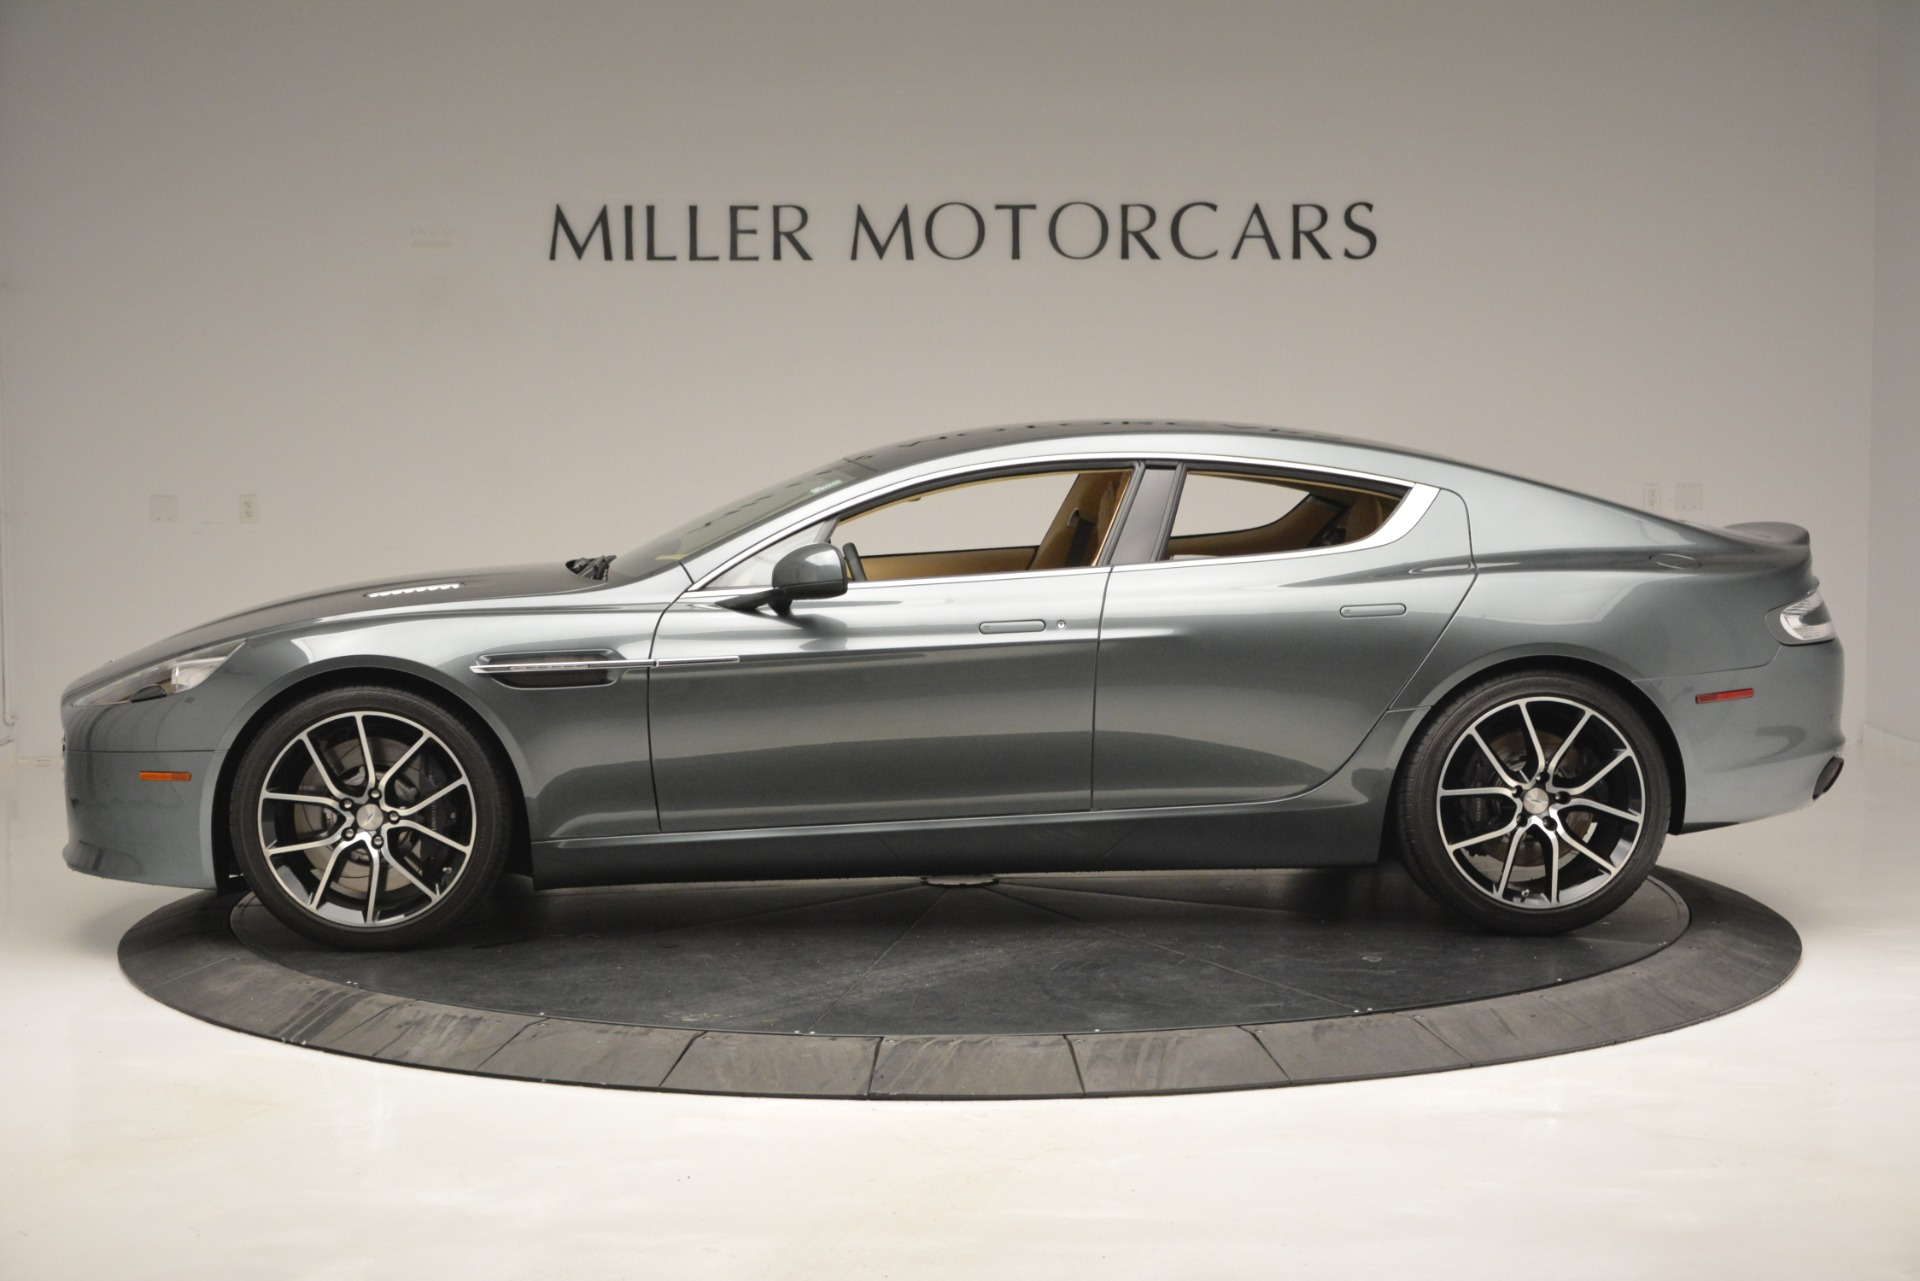 Used 2017 Aston Martin Rapide S Sedan For Sale In Greenwich, CT 2889_p3